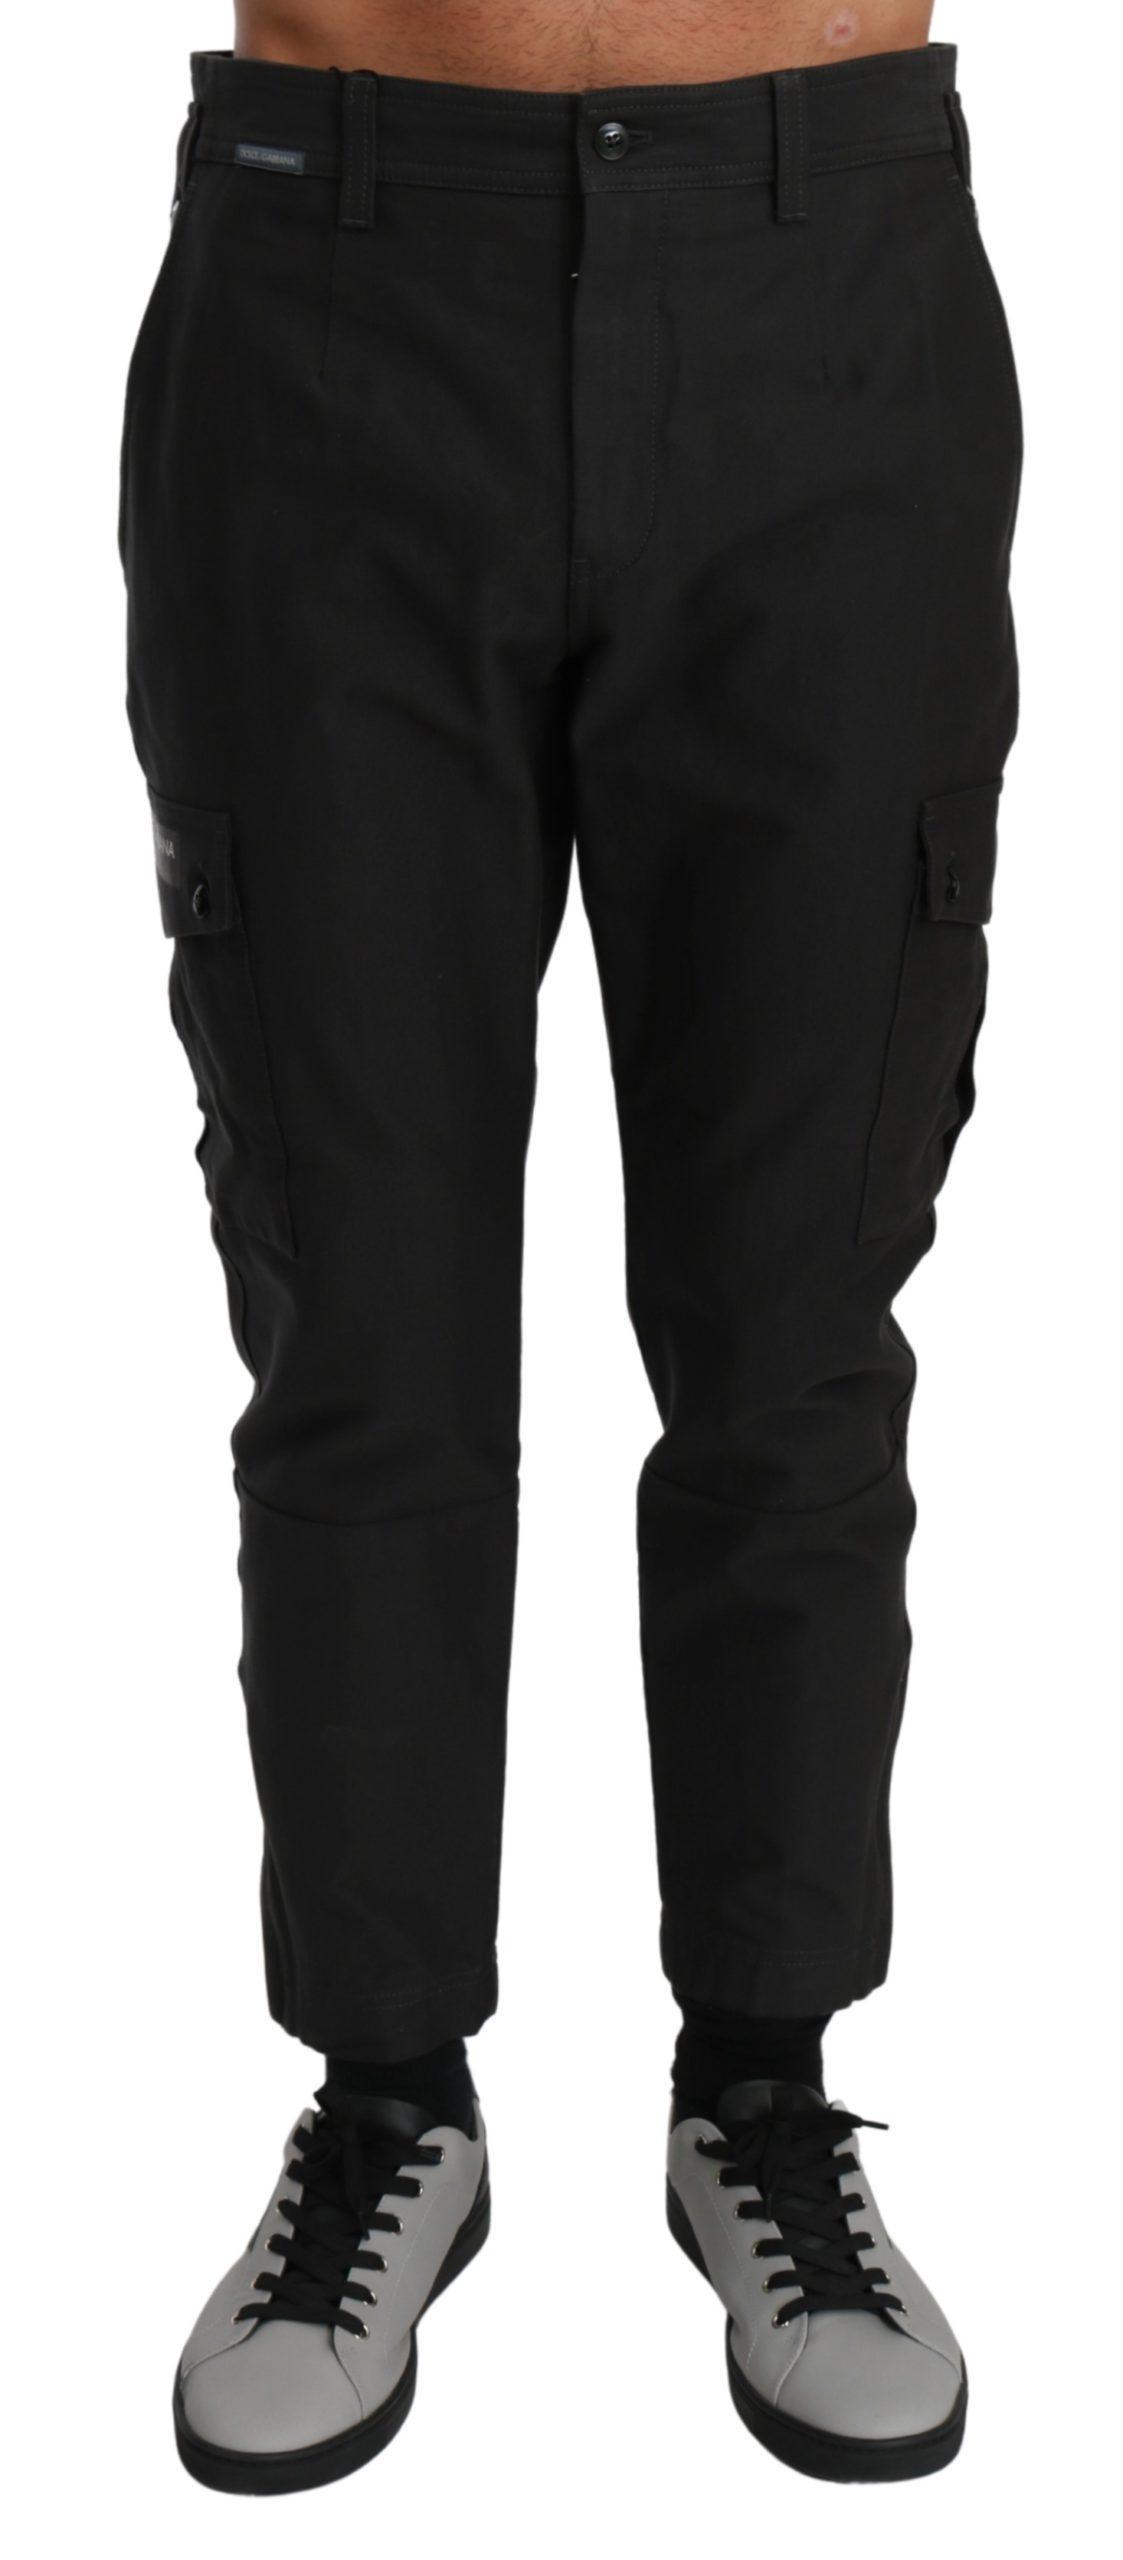 Dolce & Gabbana Men's Cargo Casual Cotton Trouser Gray PAN70991 - IT48   M